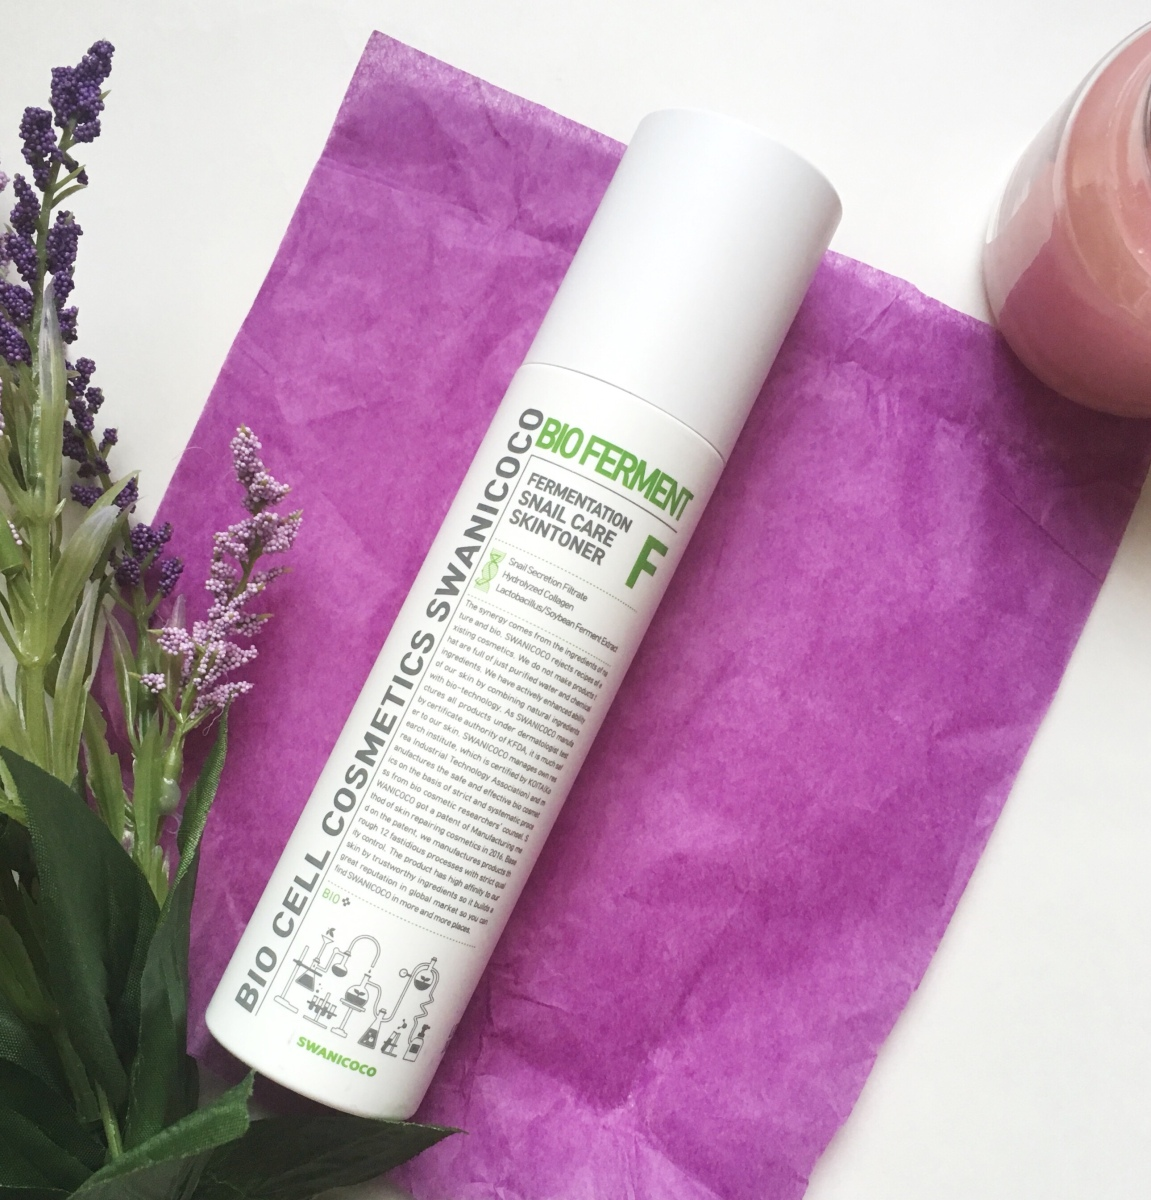 Review Swanicoco Fermentation Snail Care Skintoner I Buy Crap So Pureheals Centella 80 Eye Cream 30ml You Dont Have To